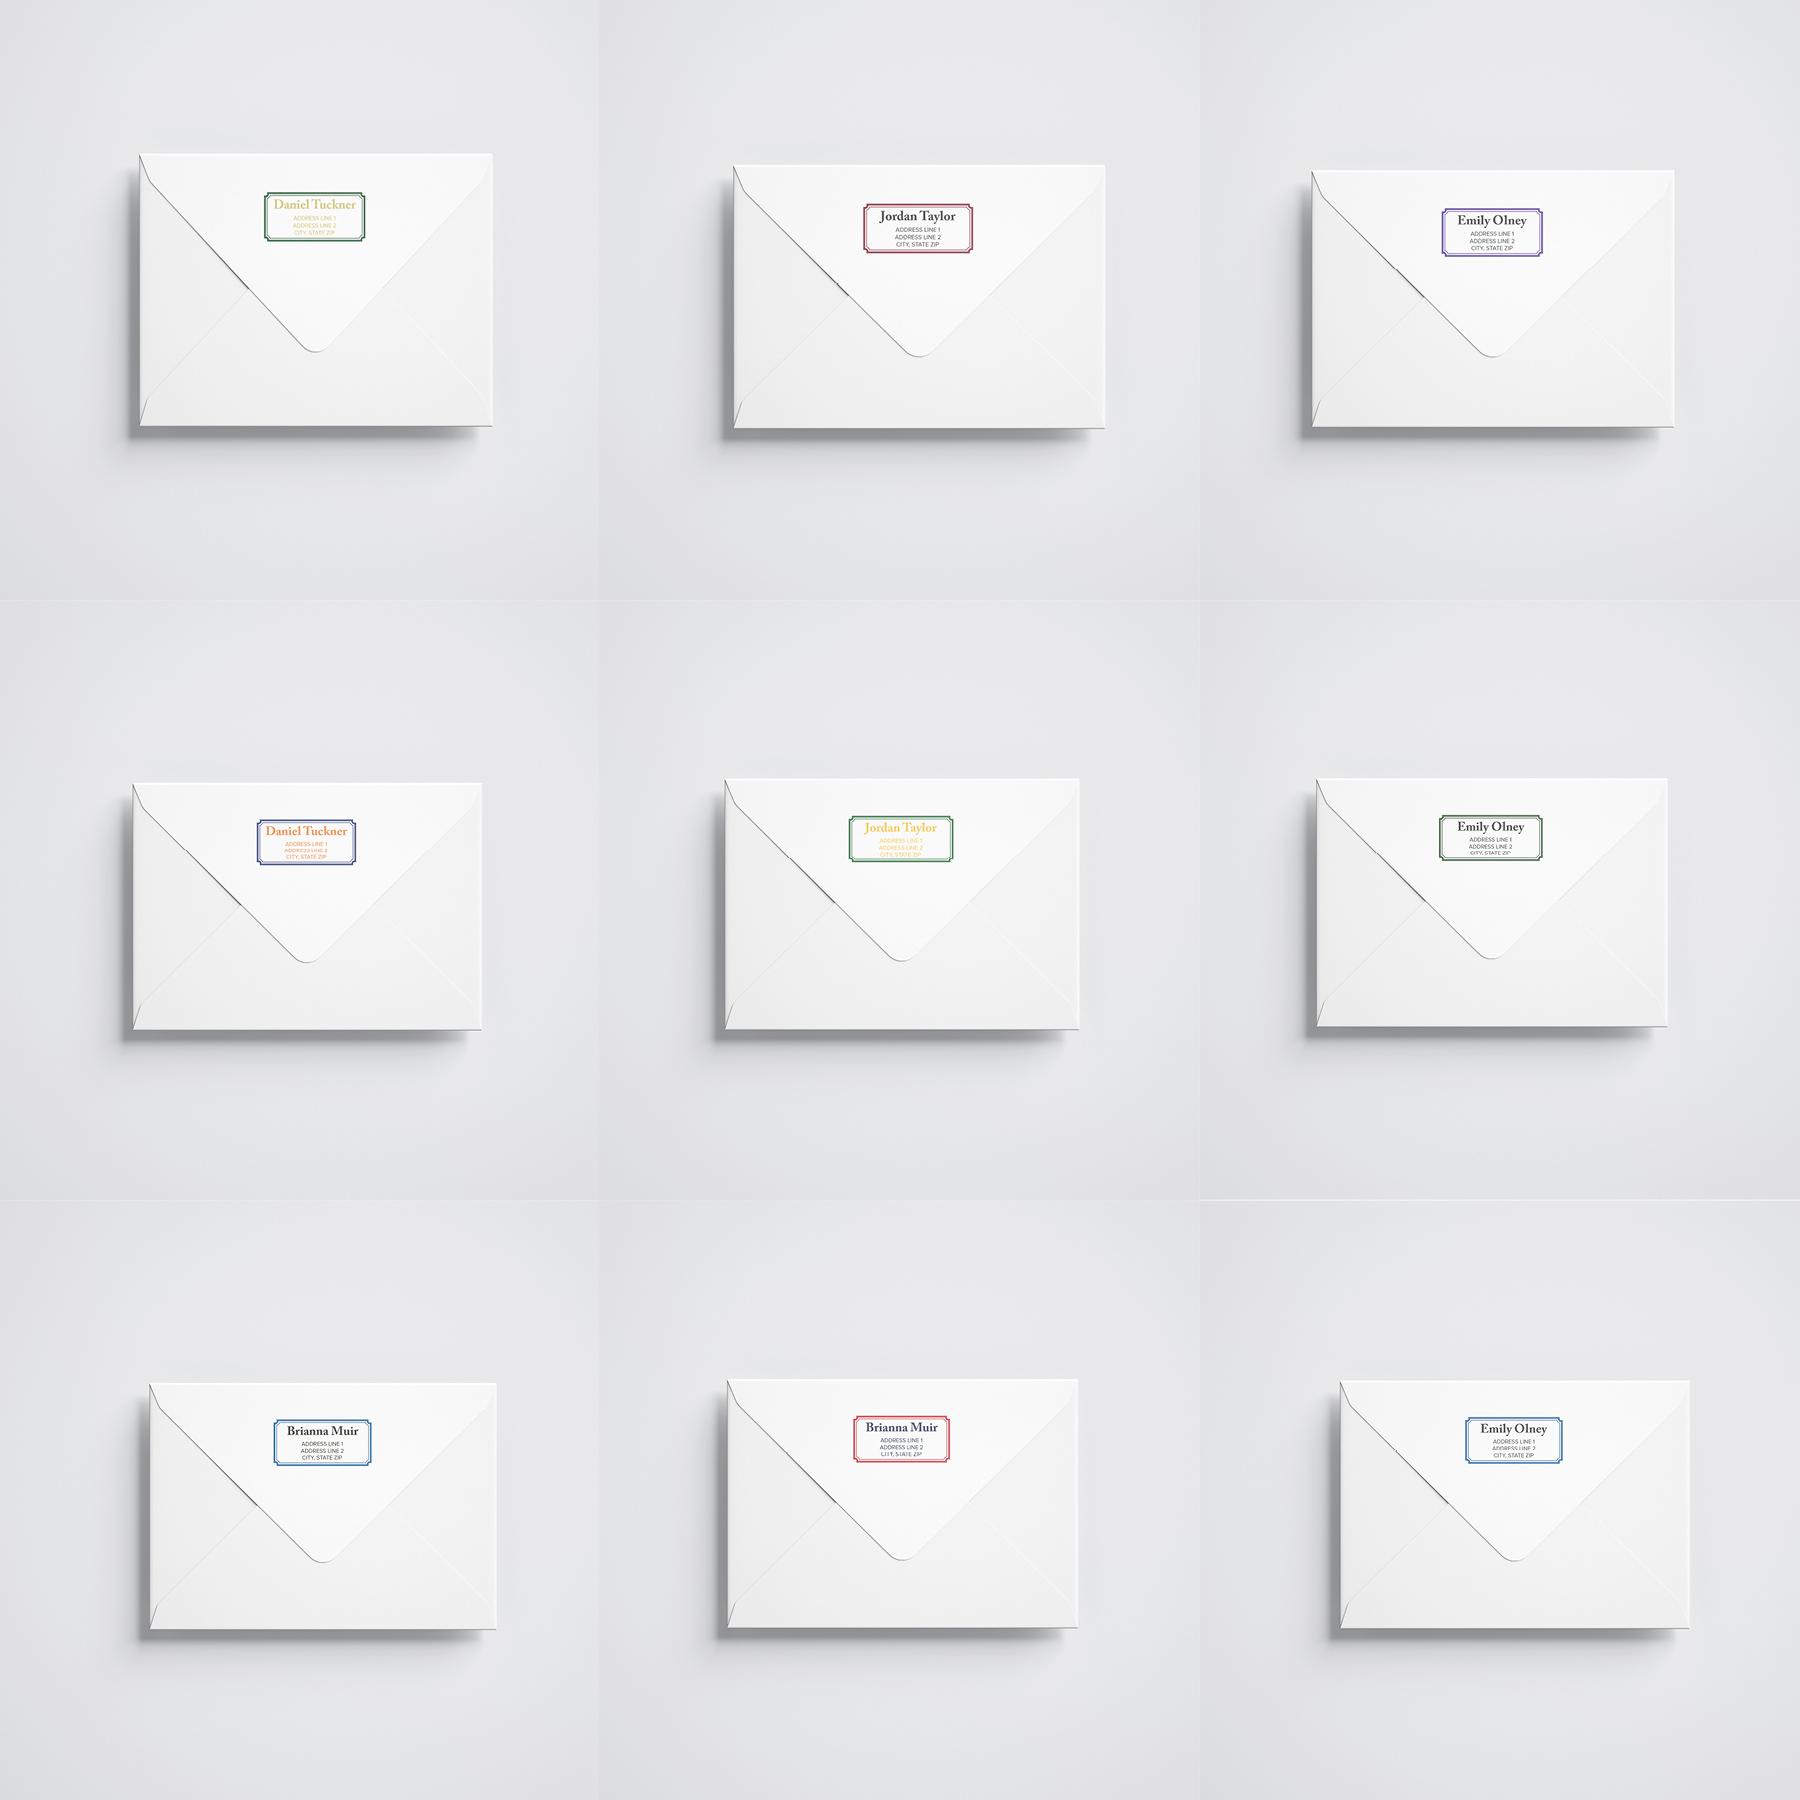 Personalized Graduation Envelopes